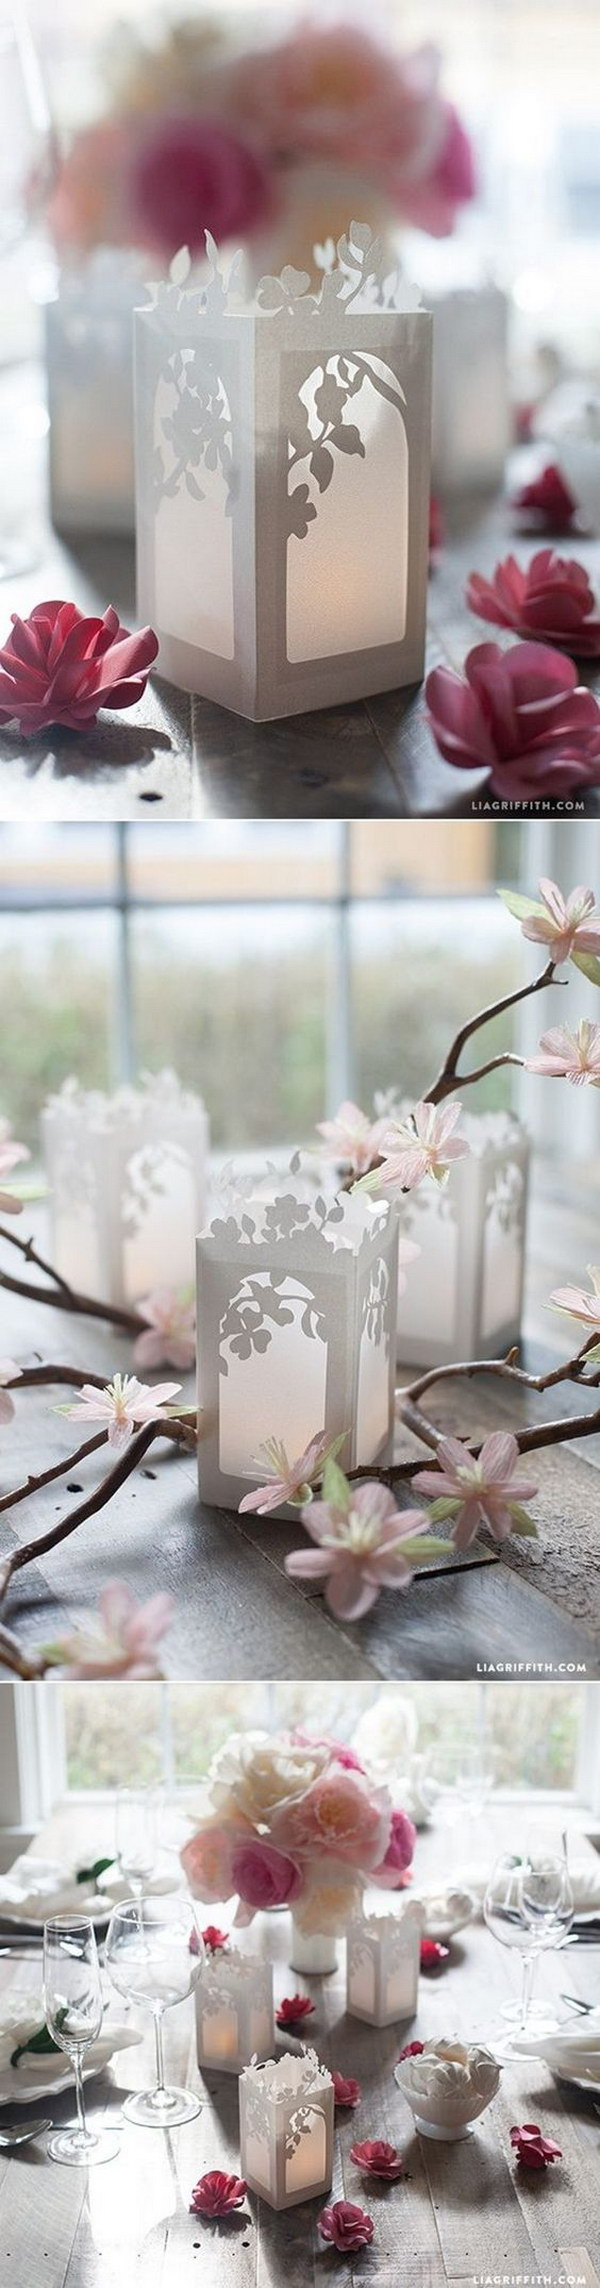 DIY Paper Lanterns Wedding Centerpieces